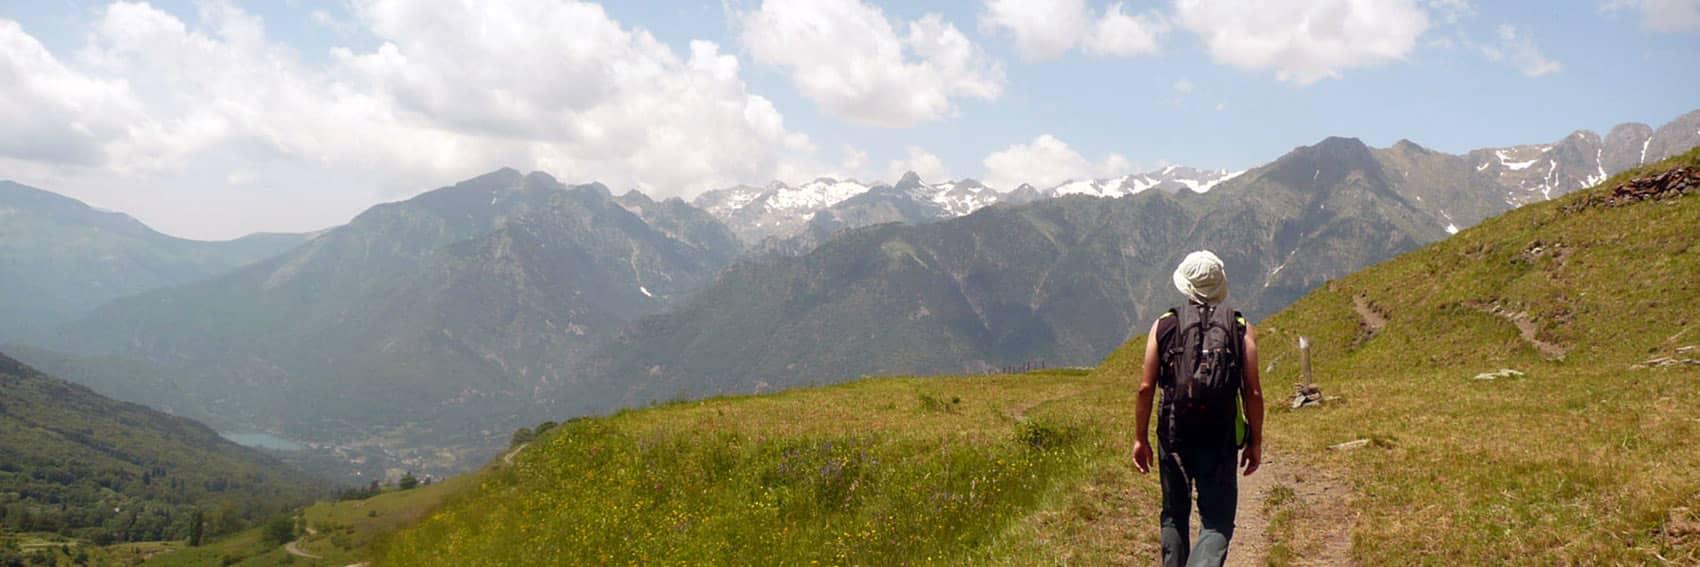 Excursion por las tres Cascadas de Cerler